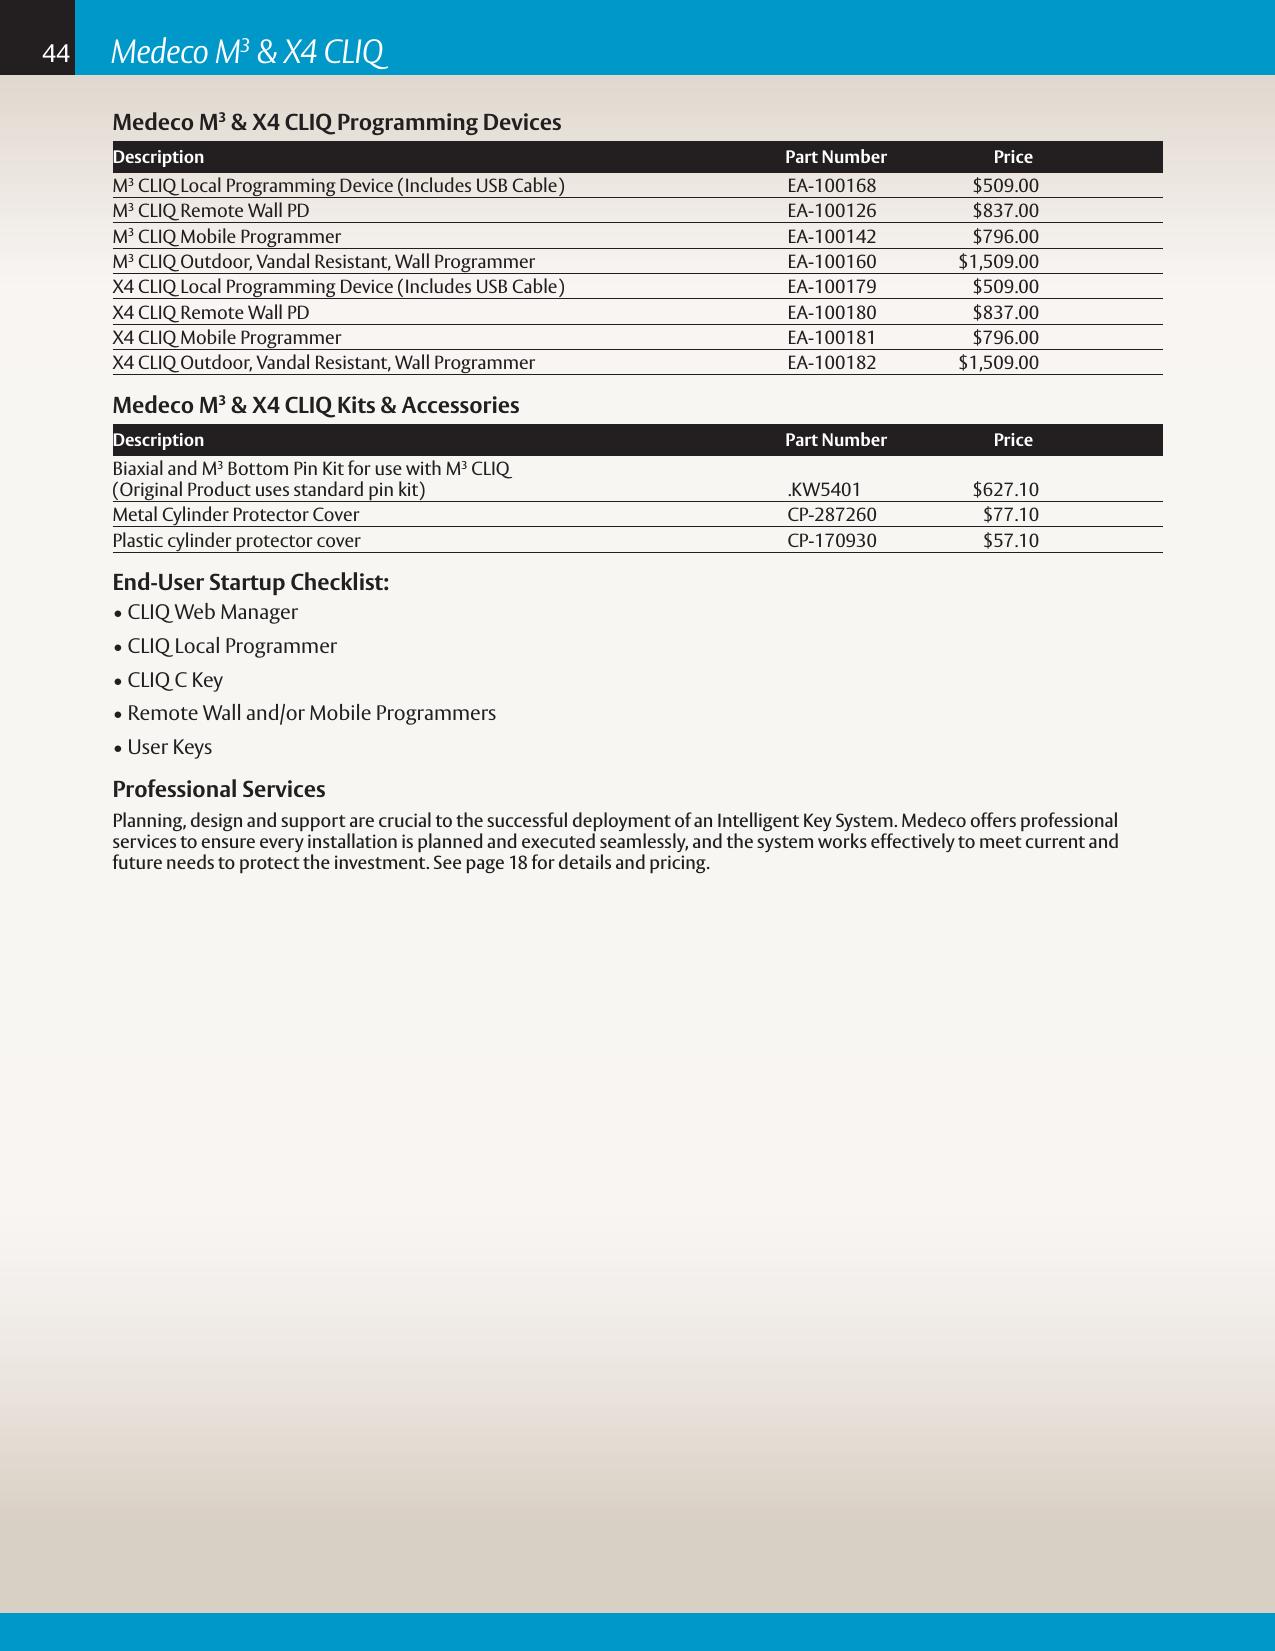 Medeco Security Locks Price Book Product Catalog 2018